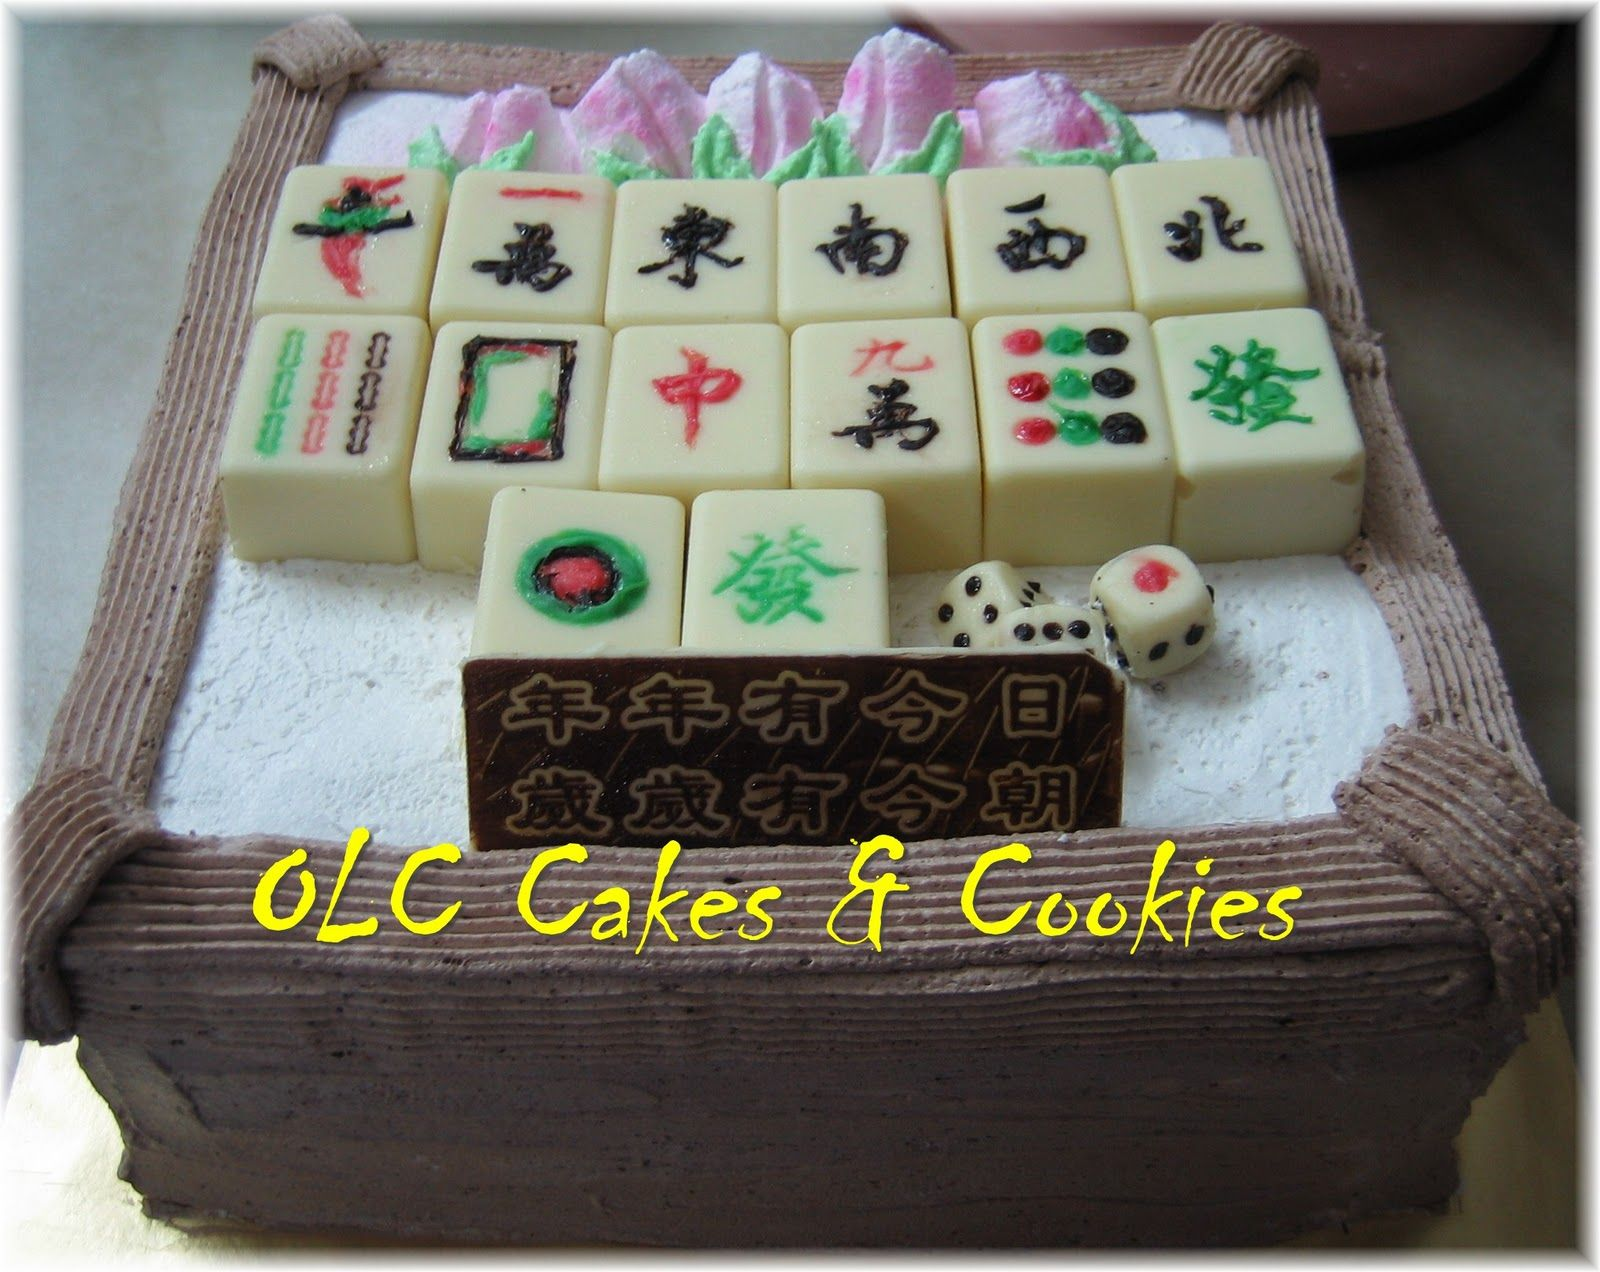 One Love Cafe Cakes Cookies Mahjong Birthday Cake Mah Jongg